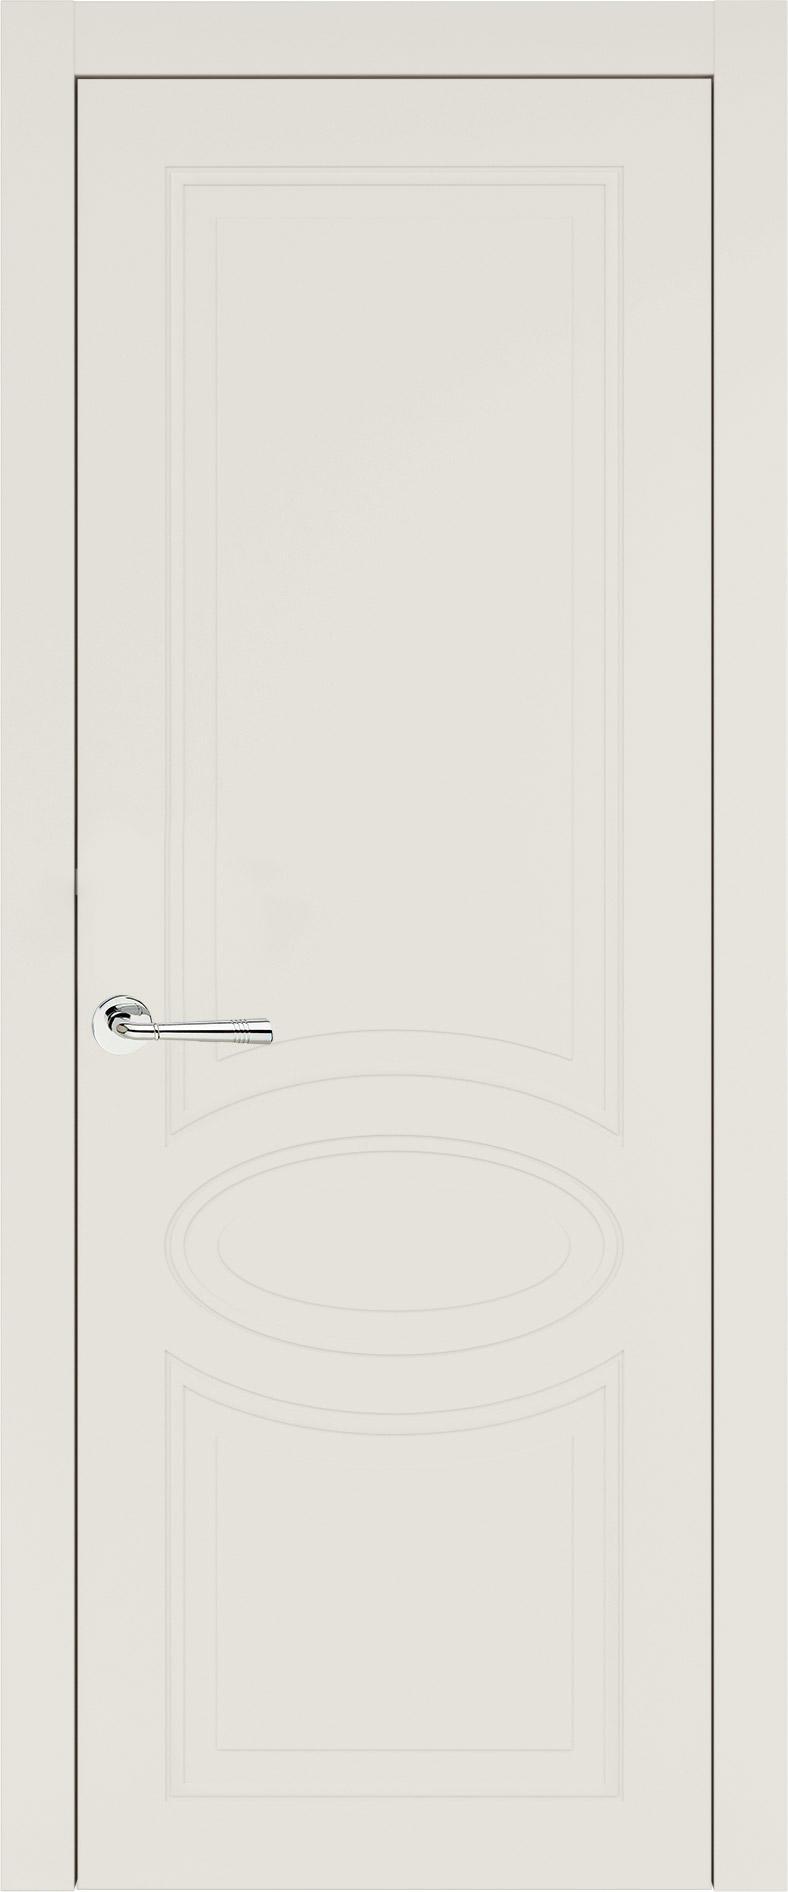 Florencia Neo Classic цвет - Бежевая эмаль (RAL 9010) Без стекла (ДГ)